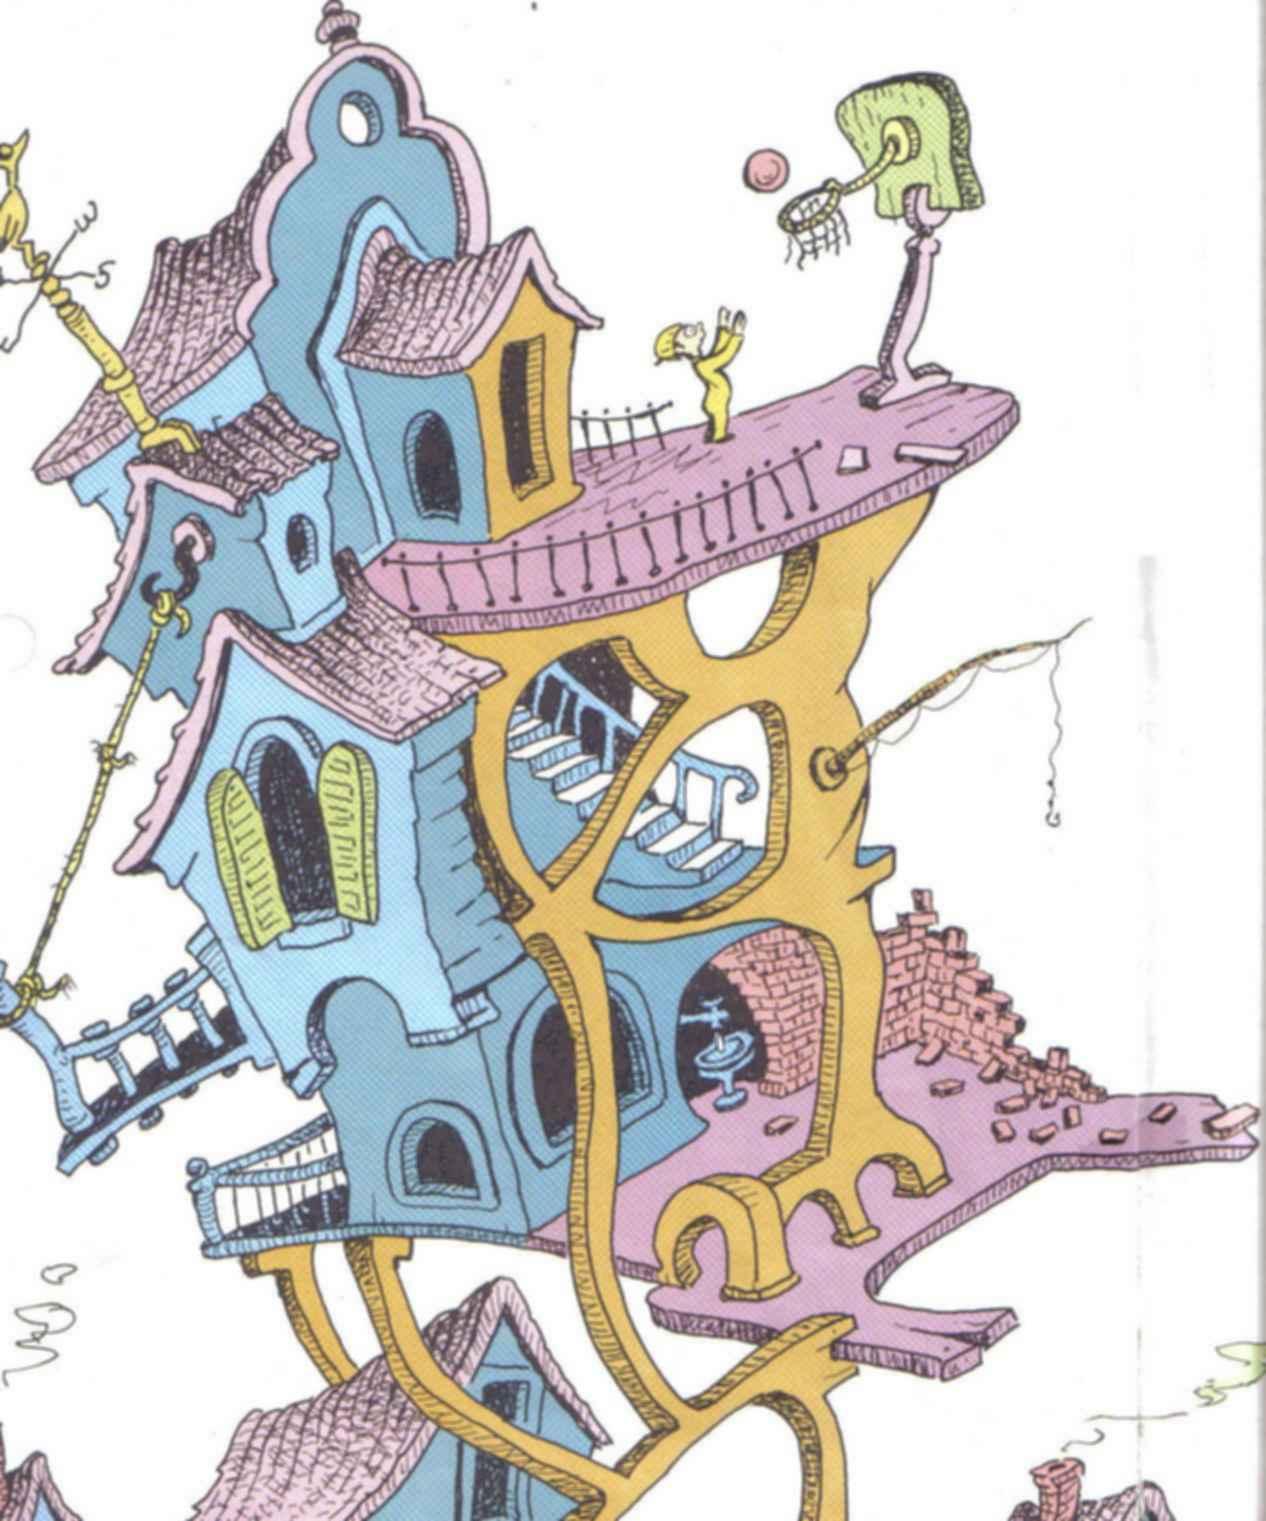 Dr. Seuss House - Inspiration